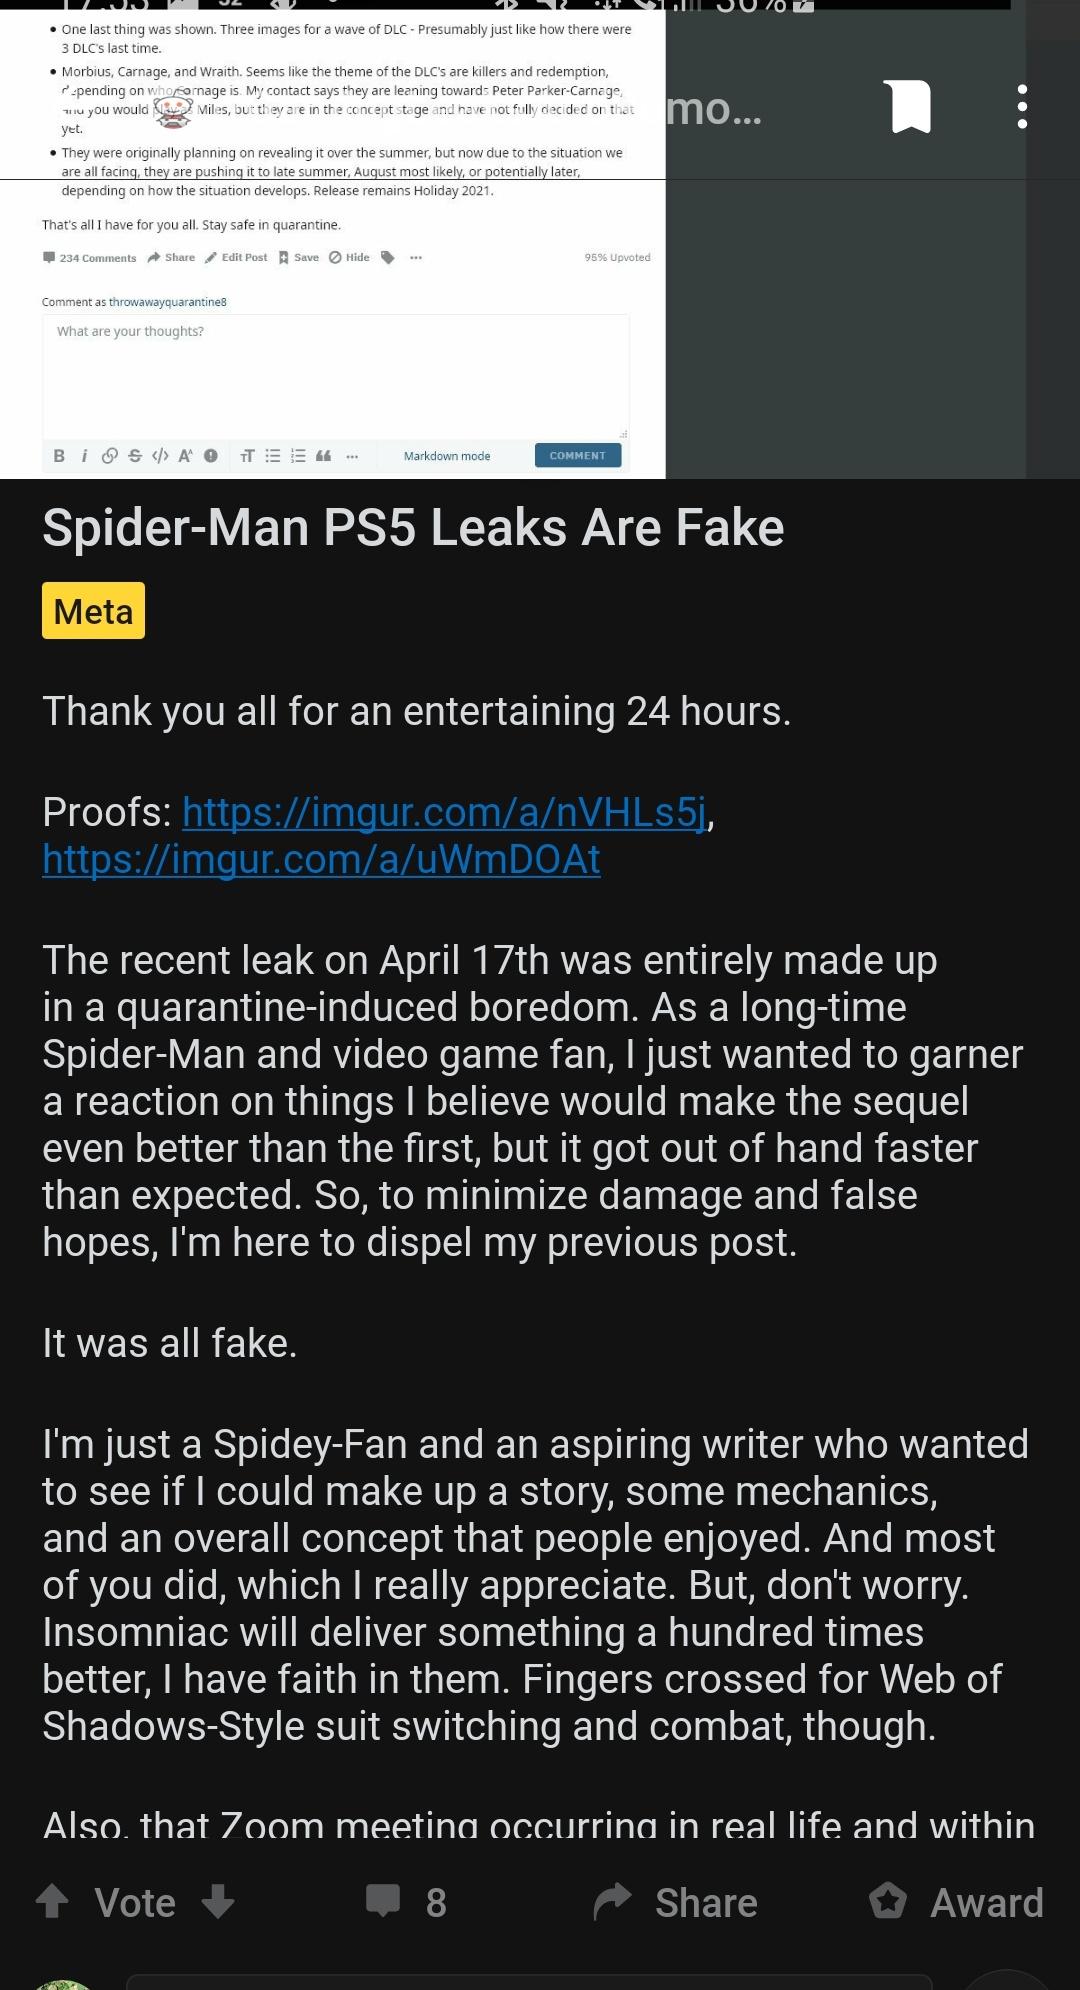 https://gta6.mobi/wp-content/uploads/2020/04/PlayStation-5-Spider-Man-2-Leak-Exposed-As-Fake.jpg